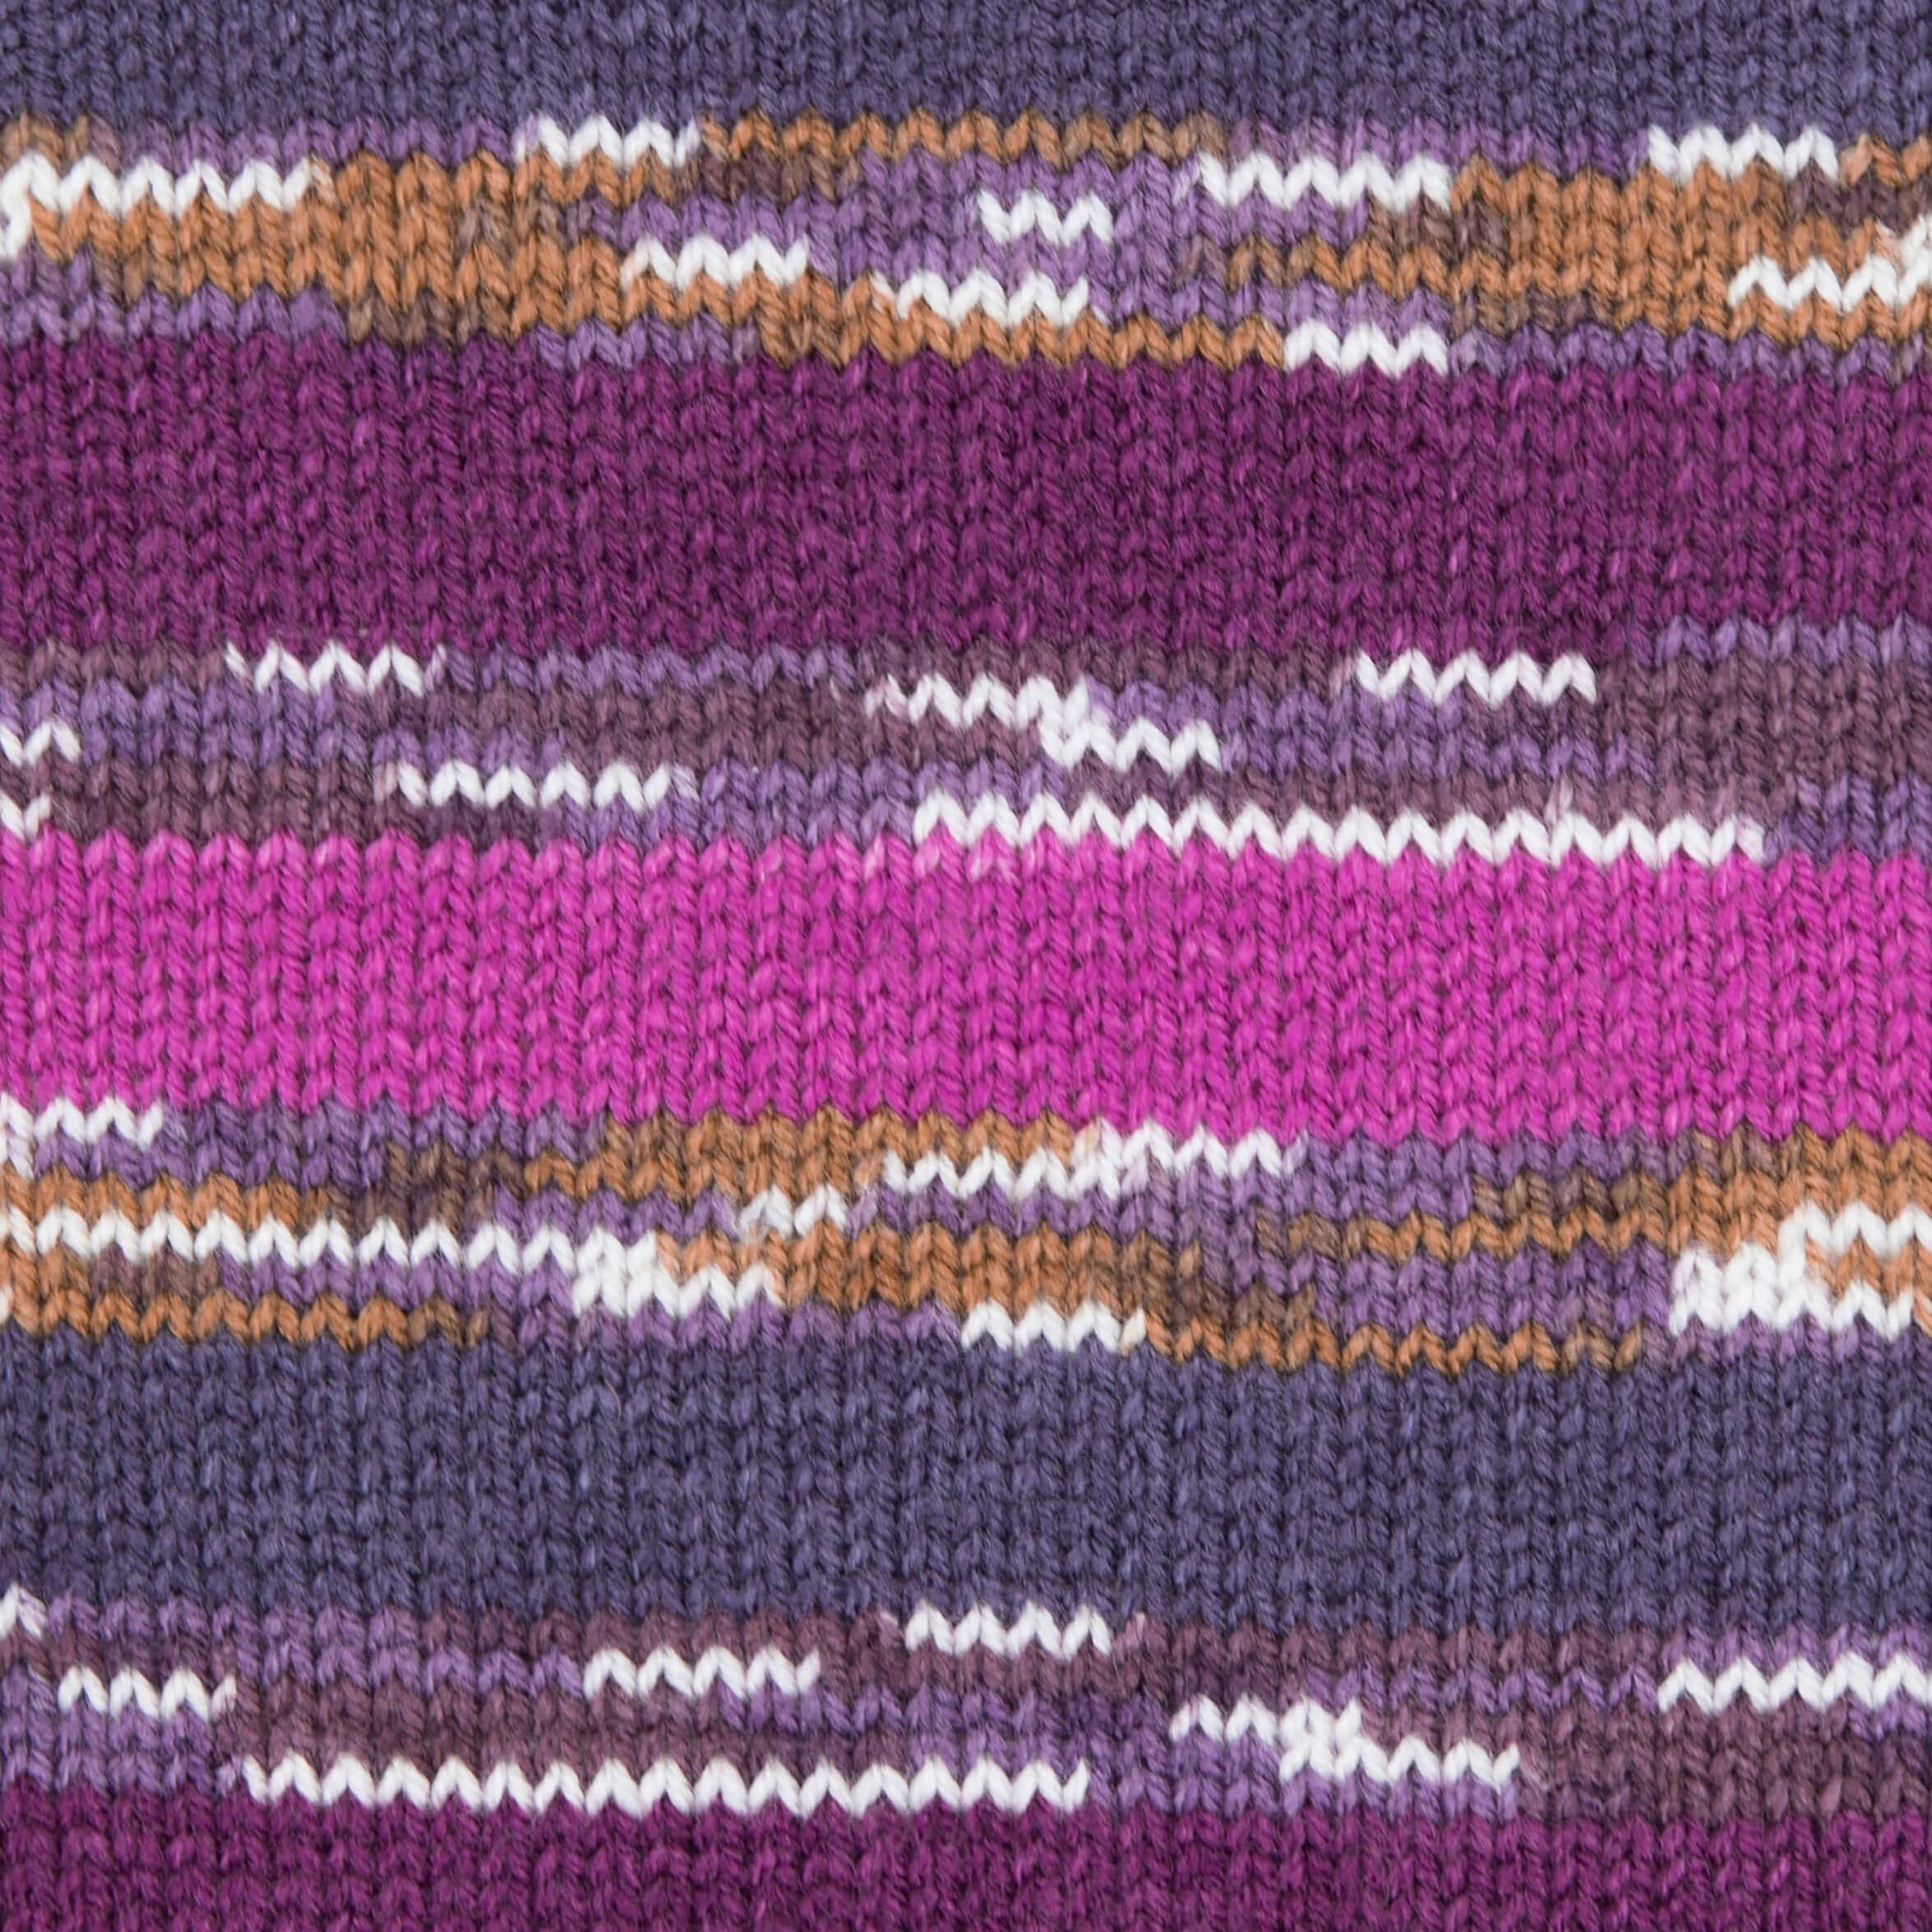 beere-violett-kamel-pflaume-weiß